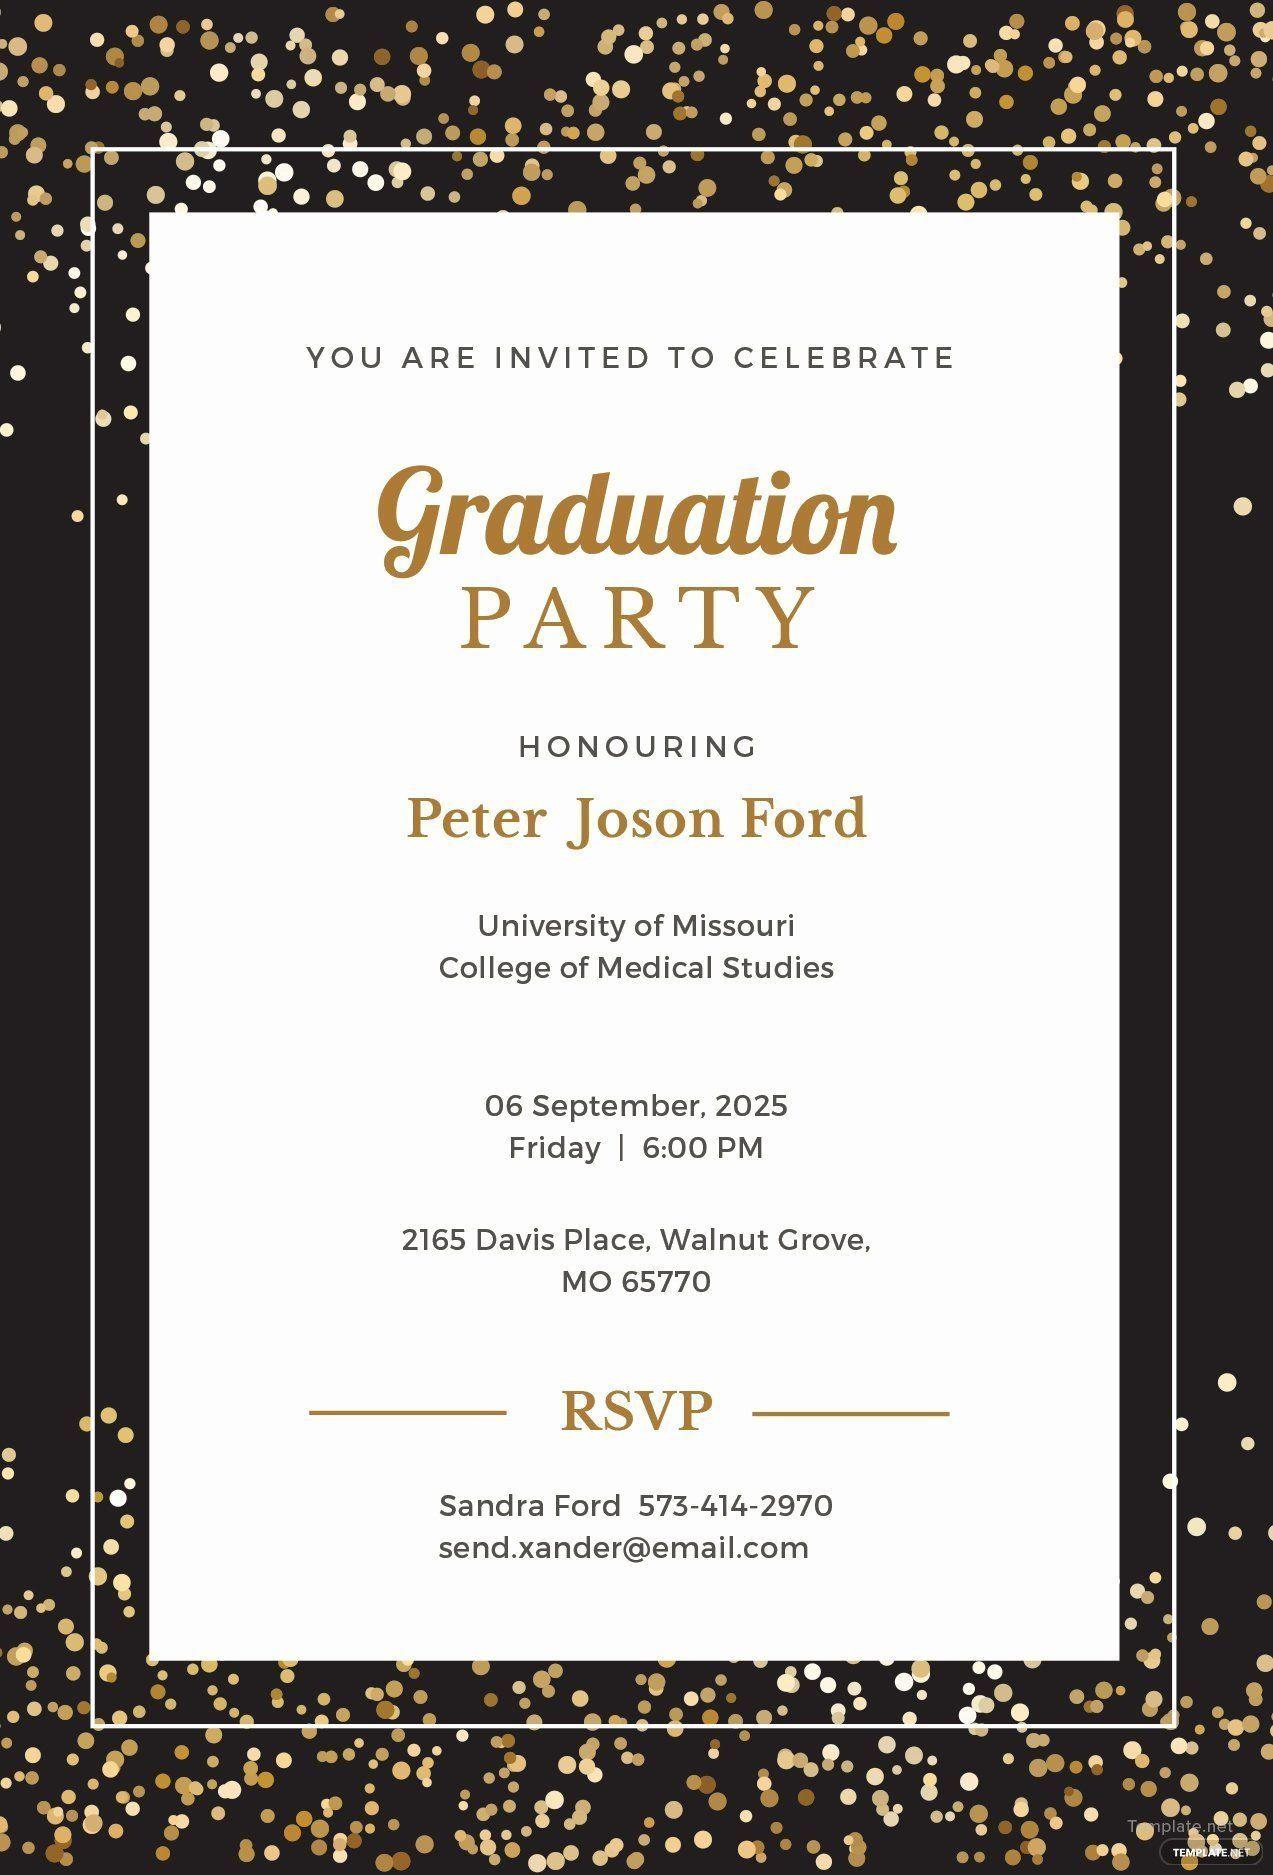 Graduation Invitation Templates Microsoft Word Fresh Free Simple Graduation Invitations Template Graduation Party Invitations Templates Graduation Invitations Microsoft word invitation template free